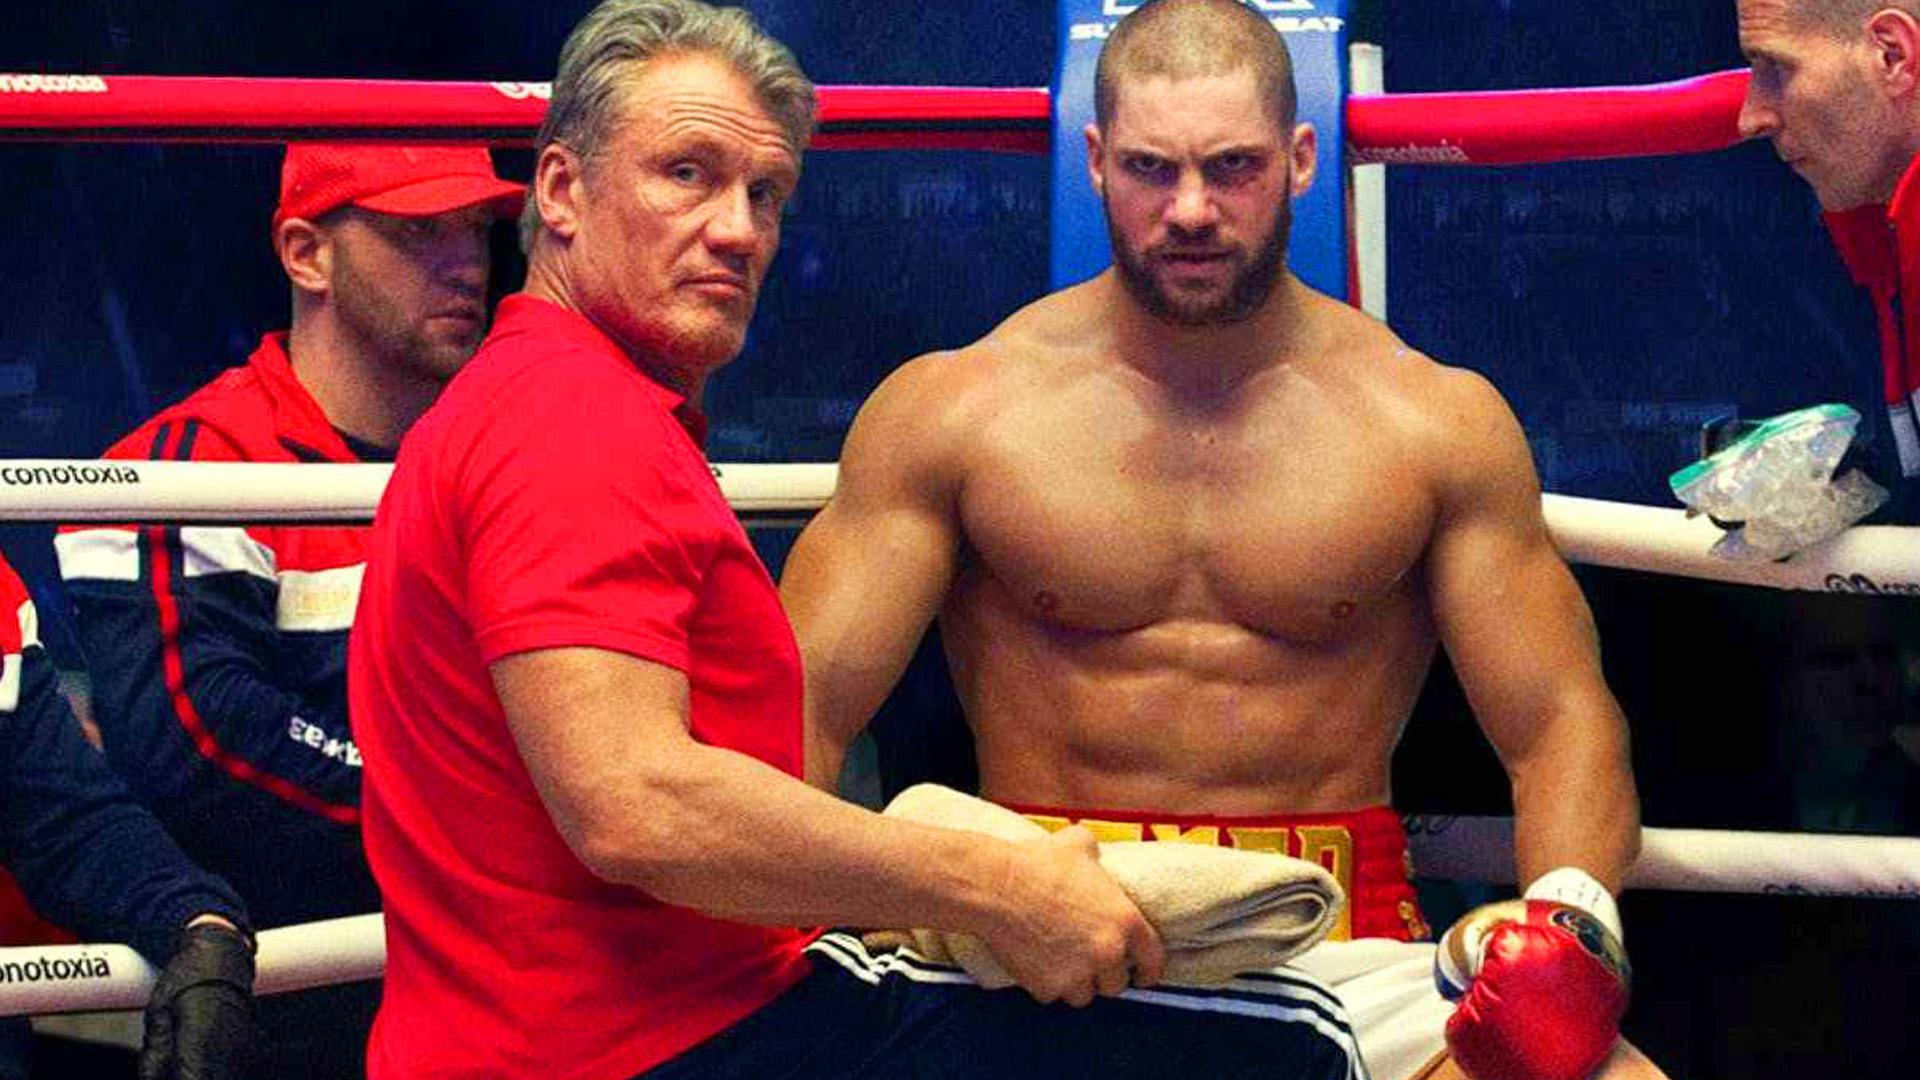 From Rocky to Creed: Ranking Rocky with Film Critic Joe Leydon